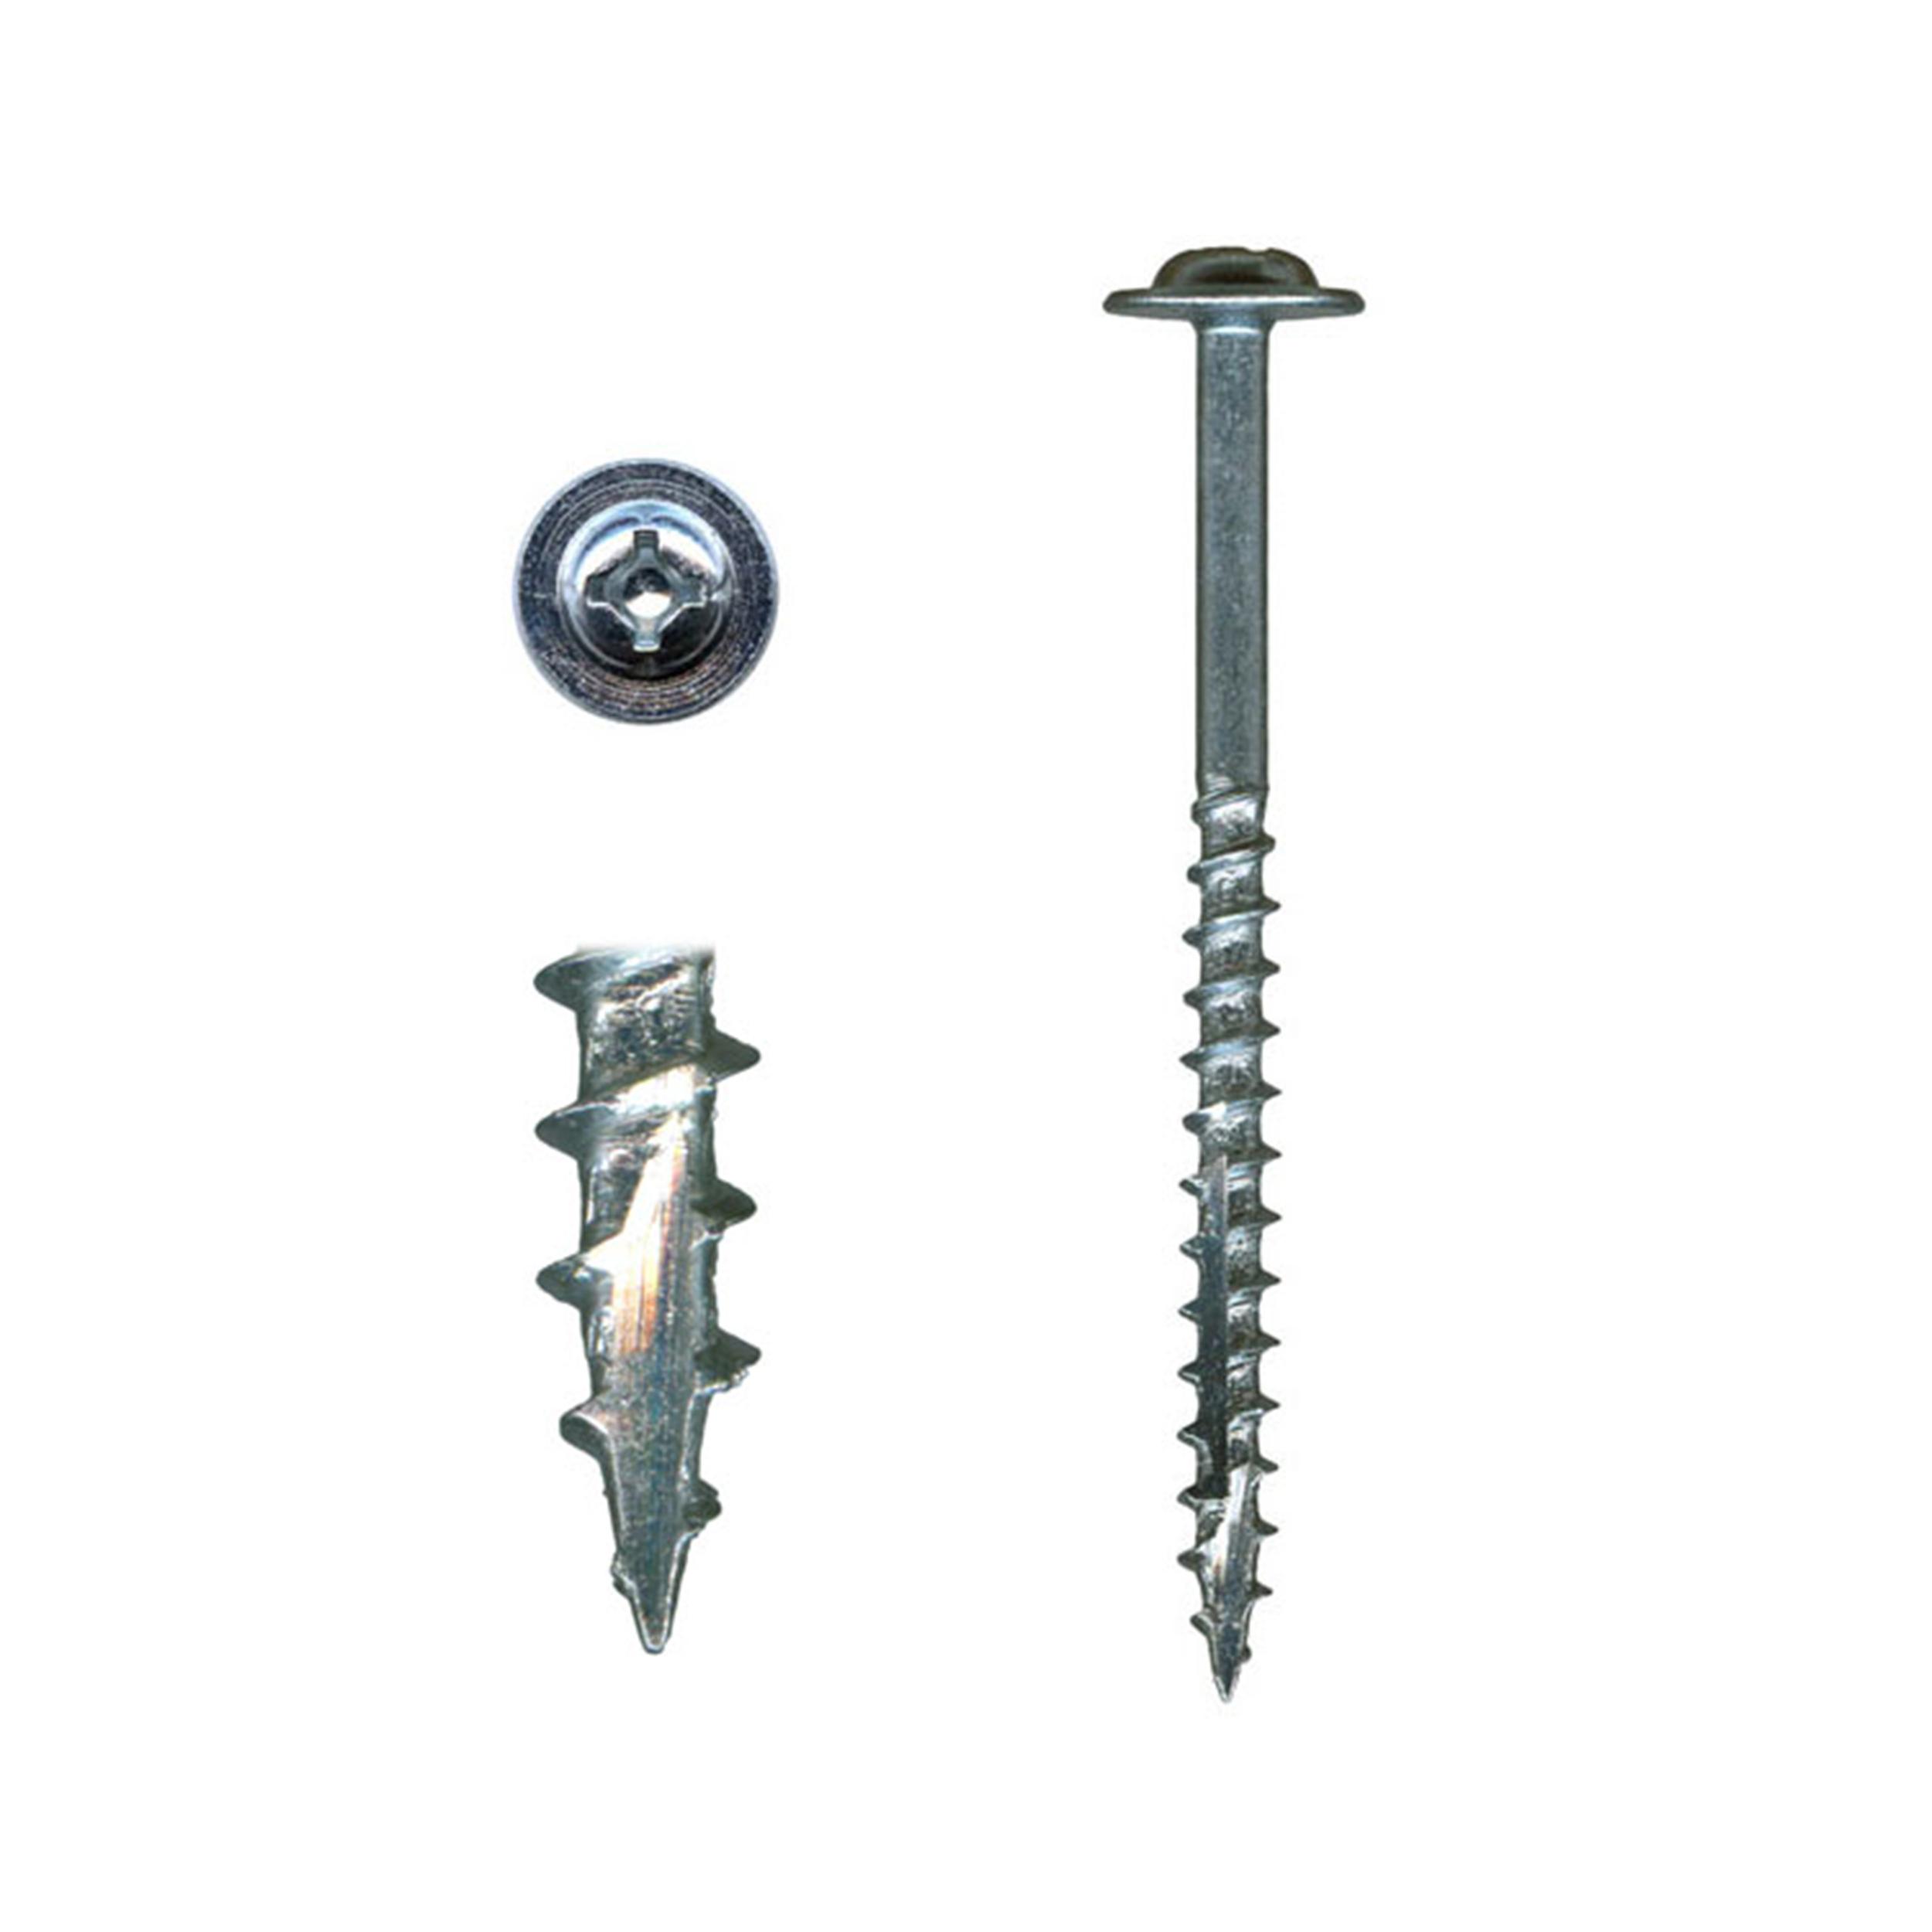 10 x 2-1/2 Cabinet Installation Screws, Washer Head, Combo Drive, Zinc, 100-Piece